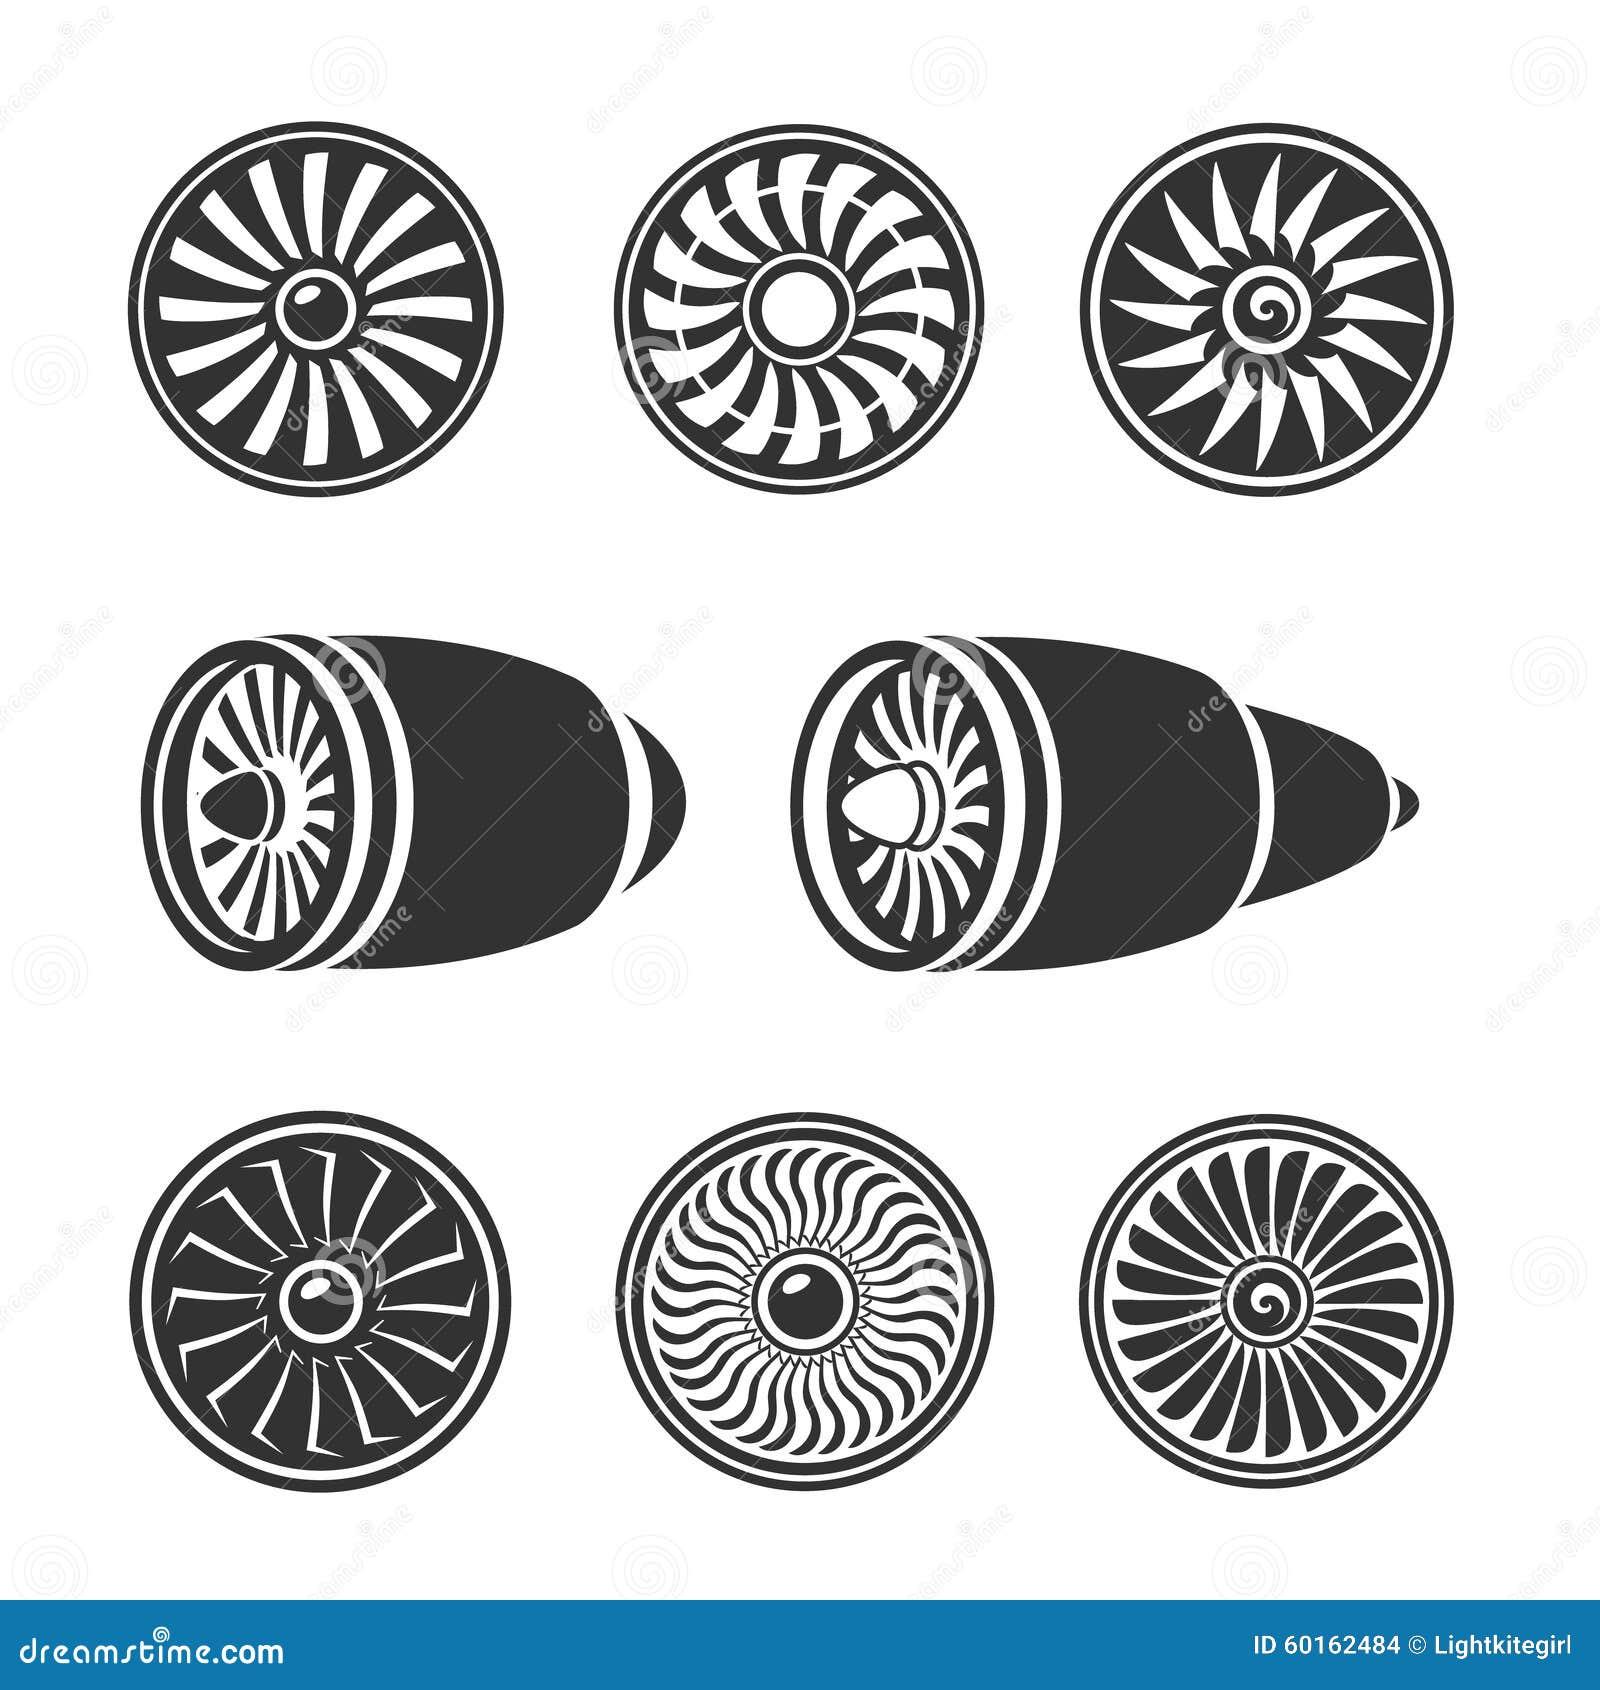 turbines icons set  airplane engine silhouettes stock